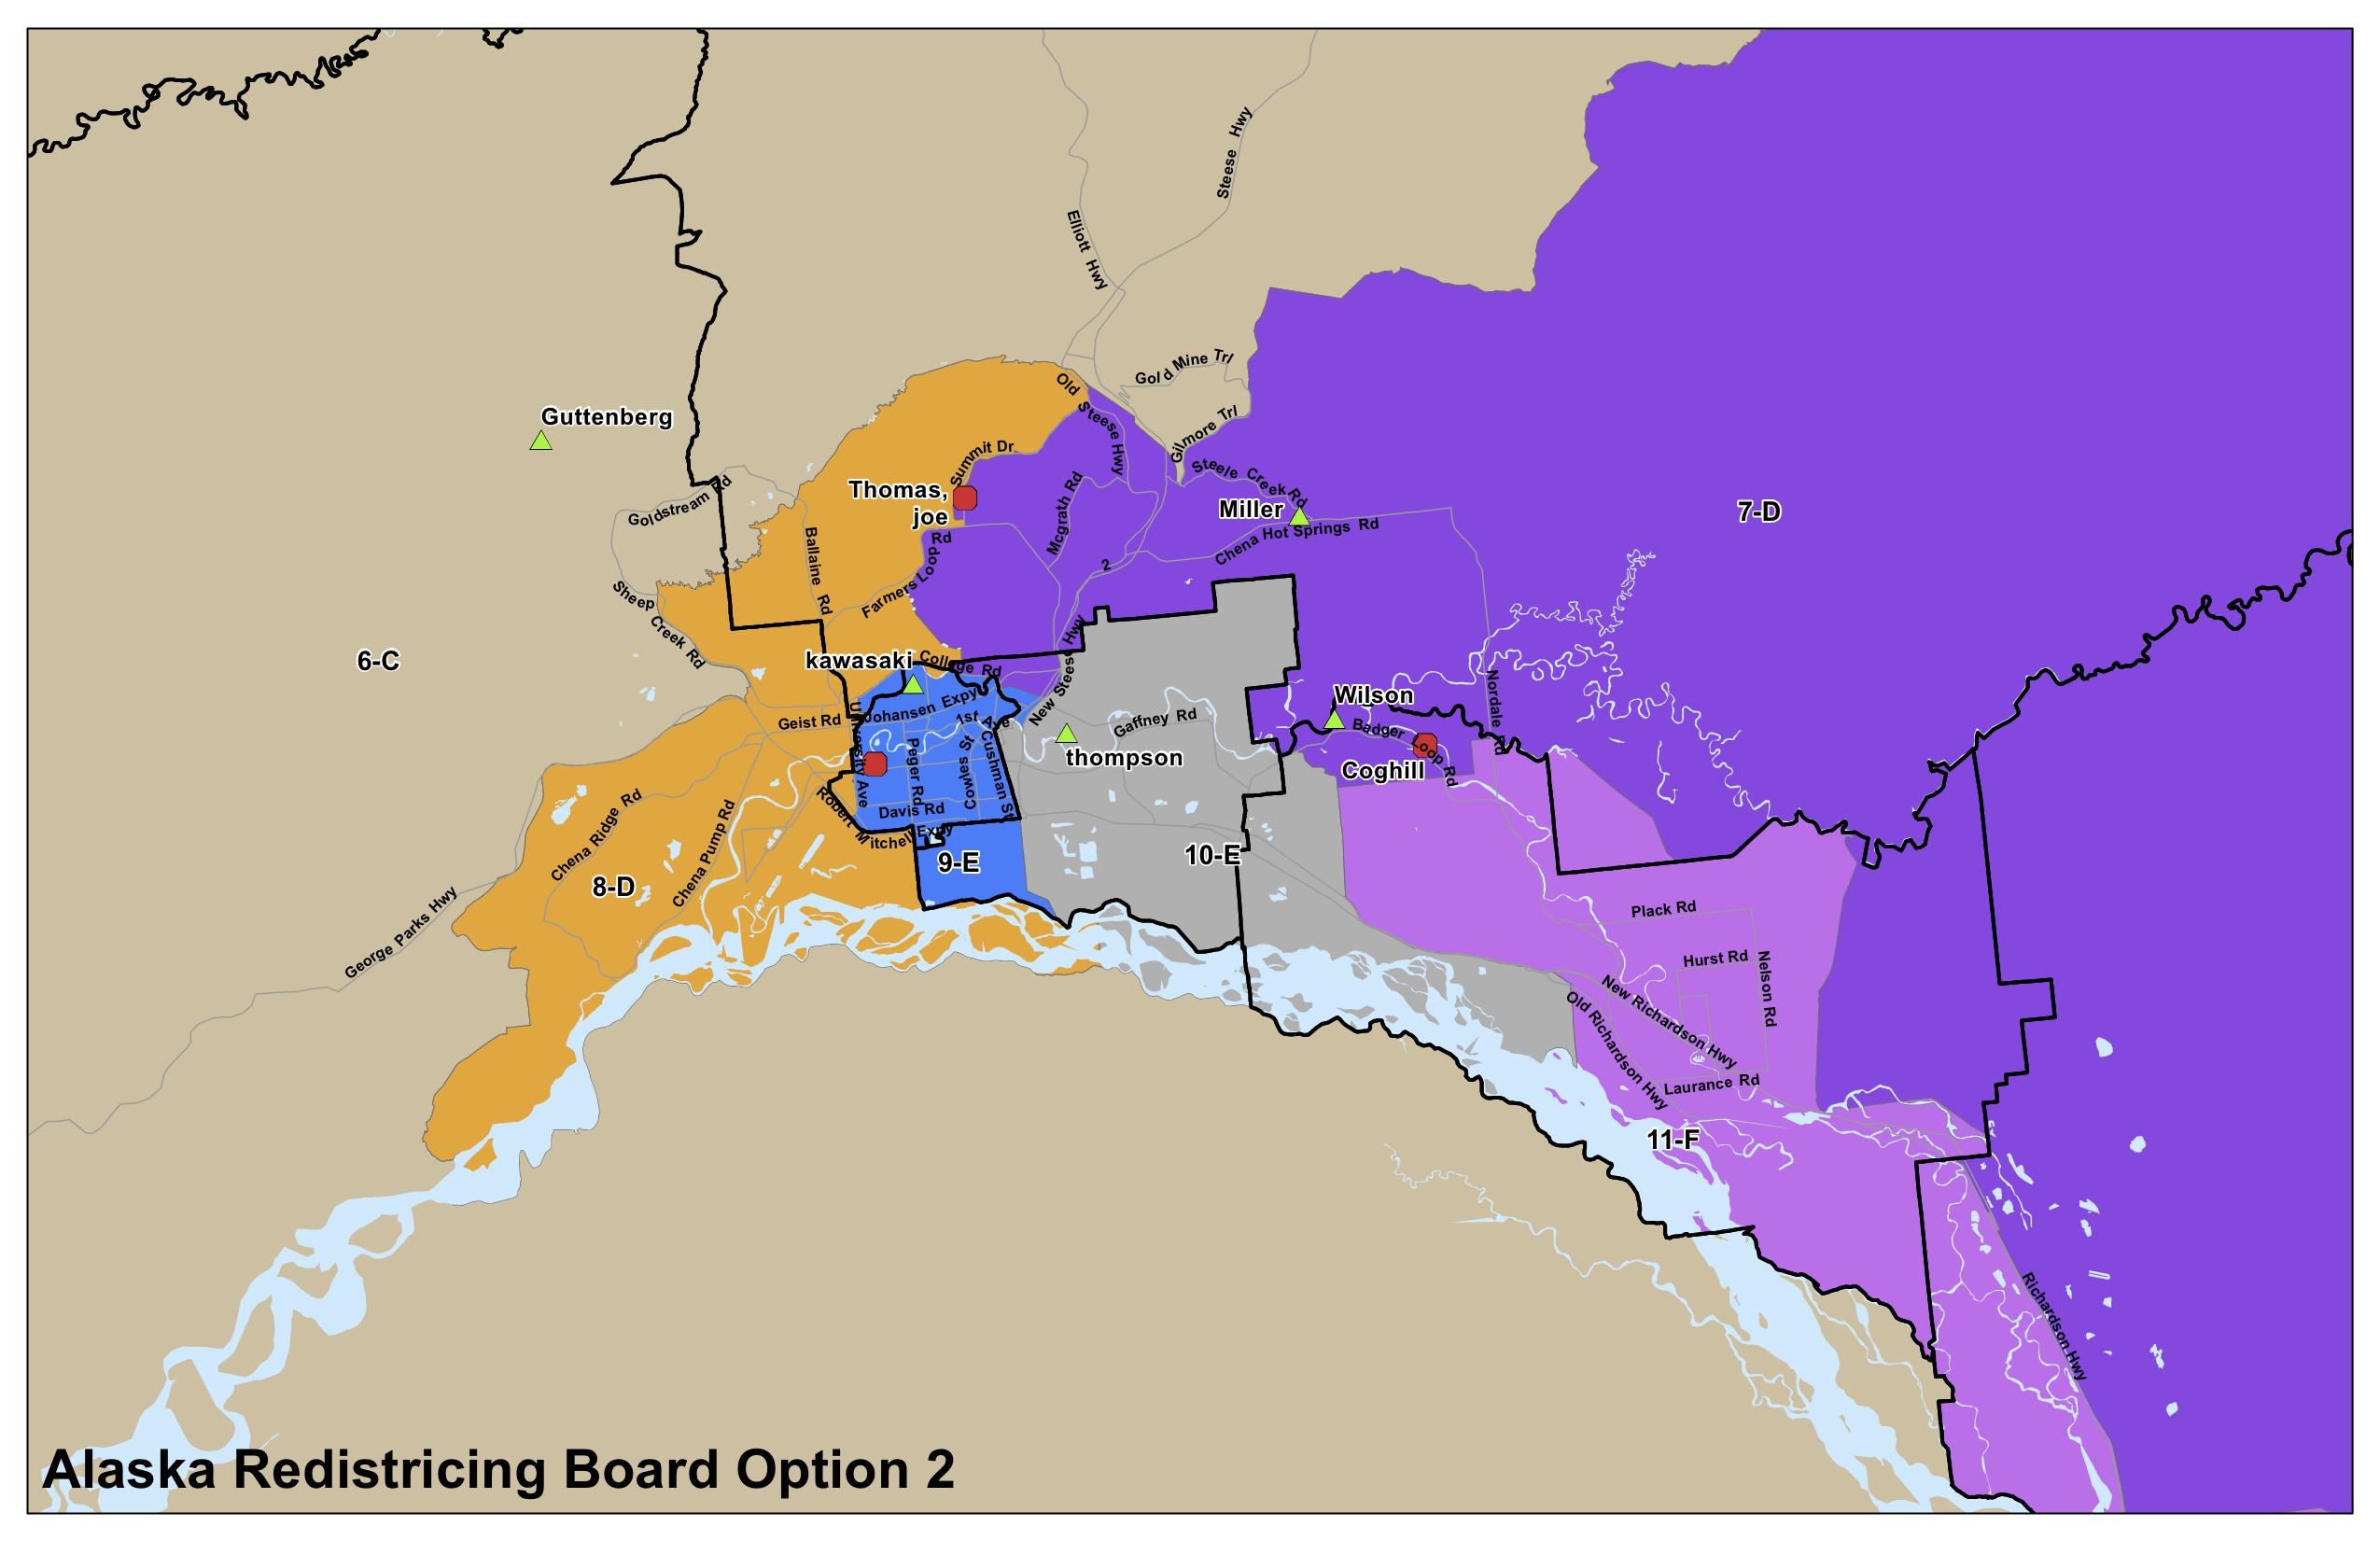 Alaskans For Fair Redistricting  Advocating Basic